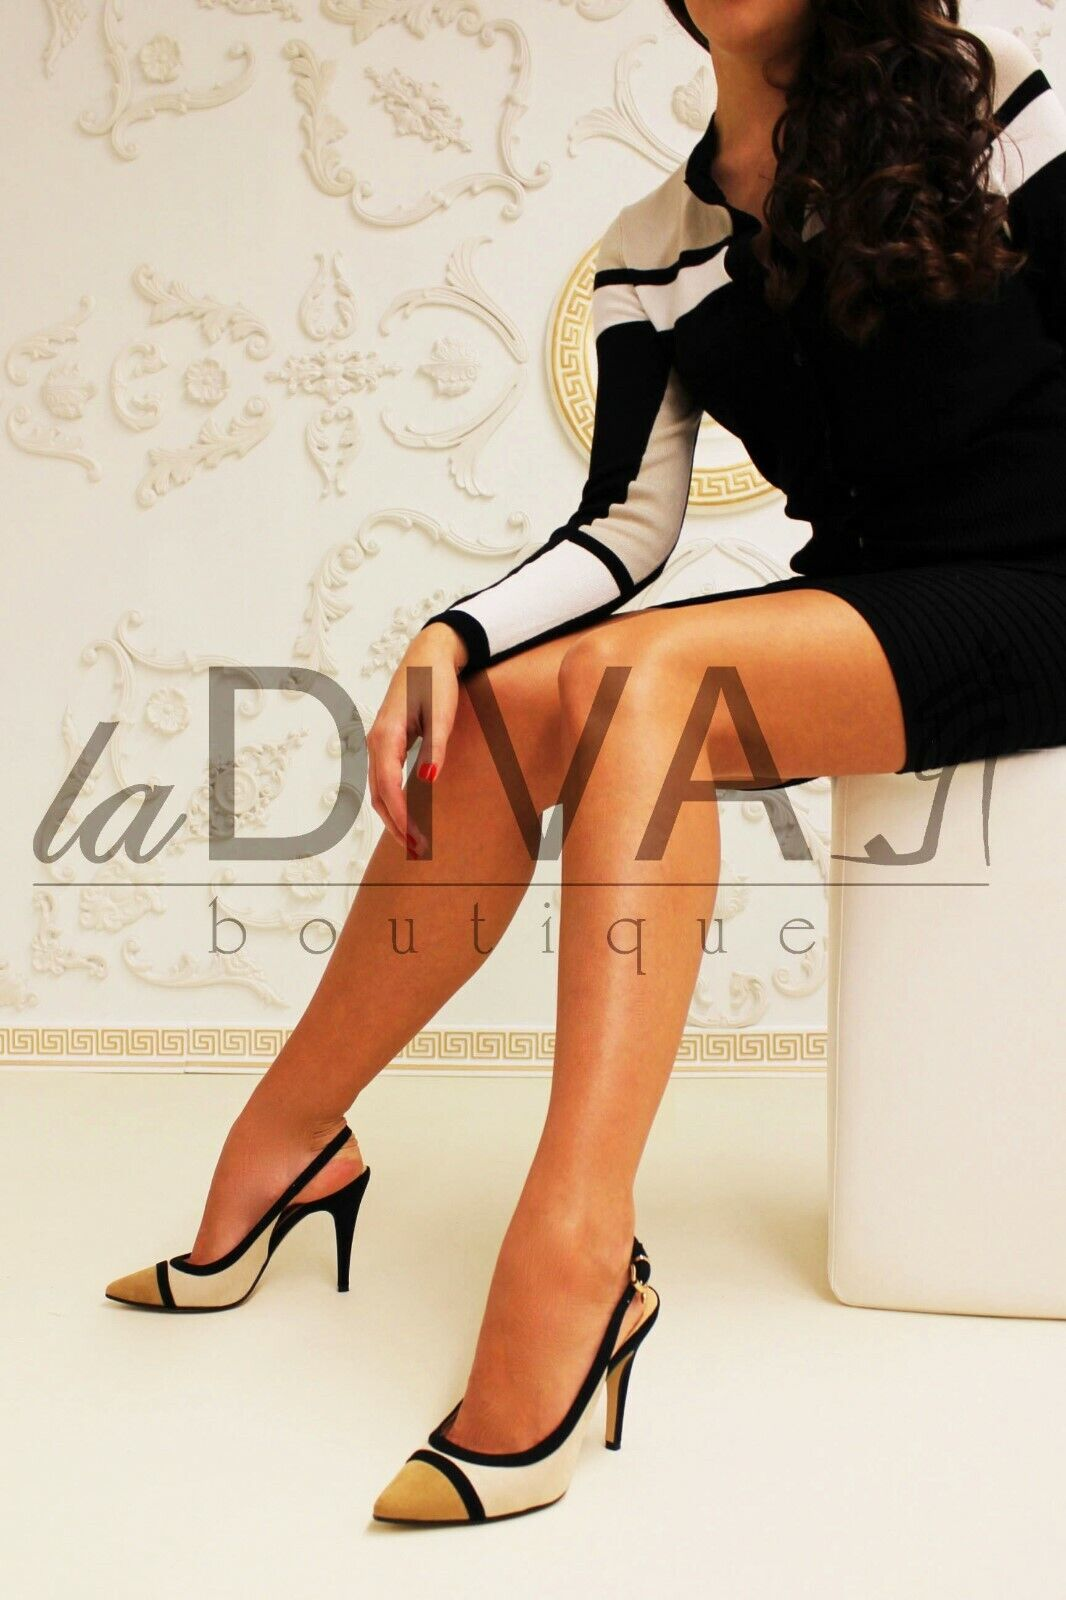 Nila Nila   Italia Business Pups Beige Natural nero 38 Leather% Sale% Ovp  ti aspetto